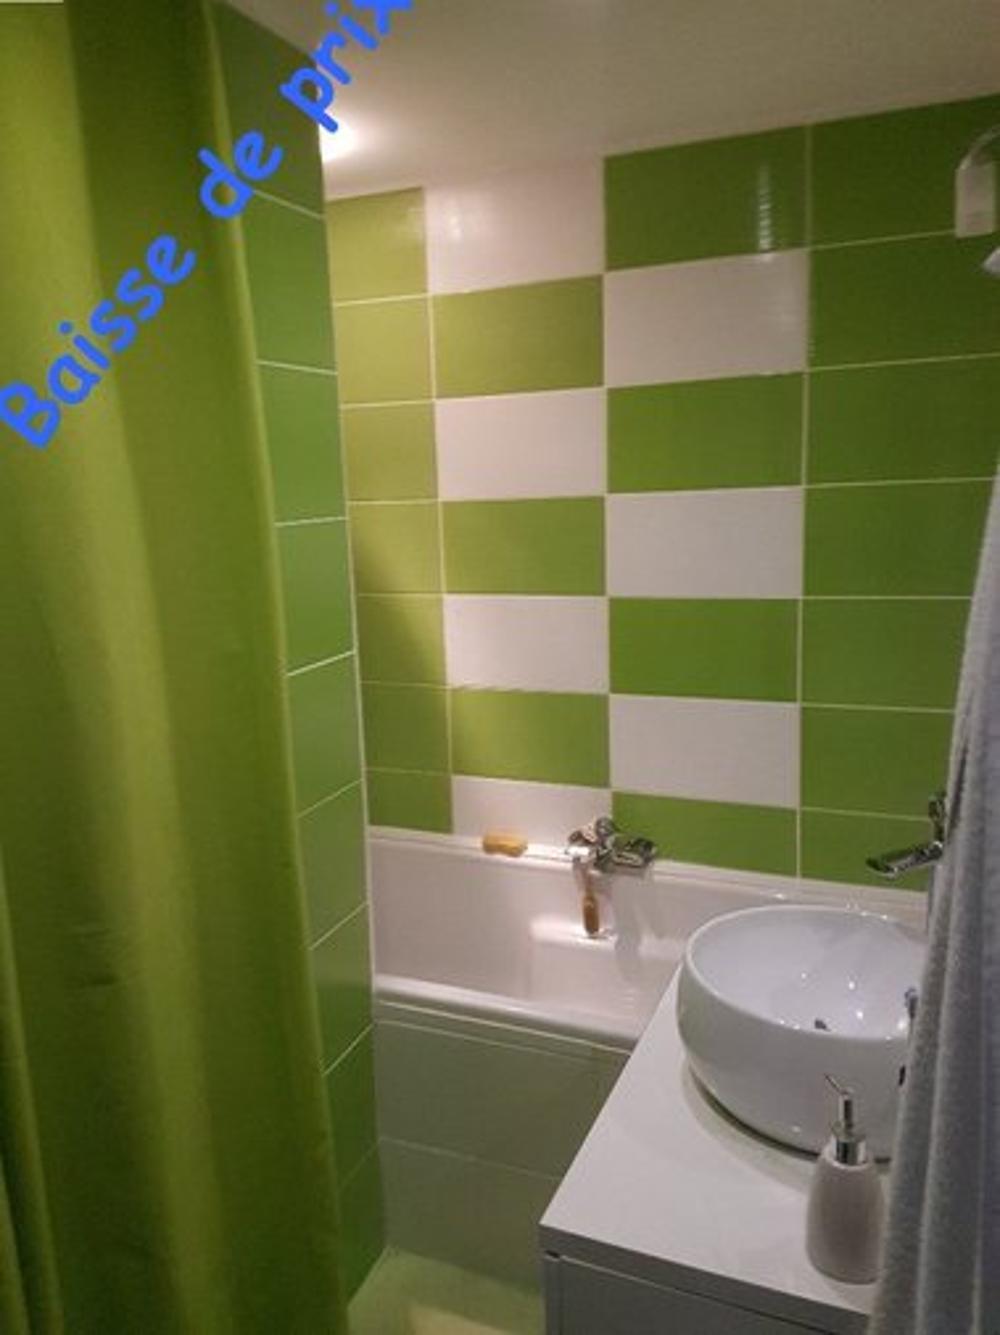 Blain Loire-Atlantique Apartment Bild 3472546